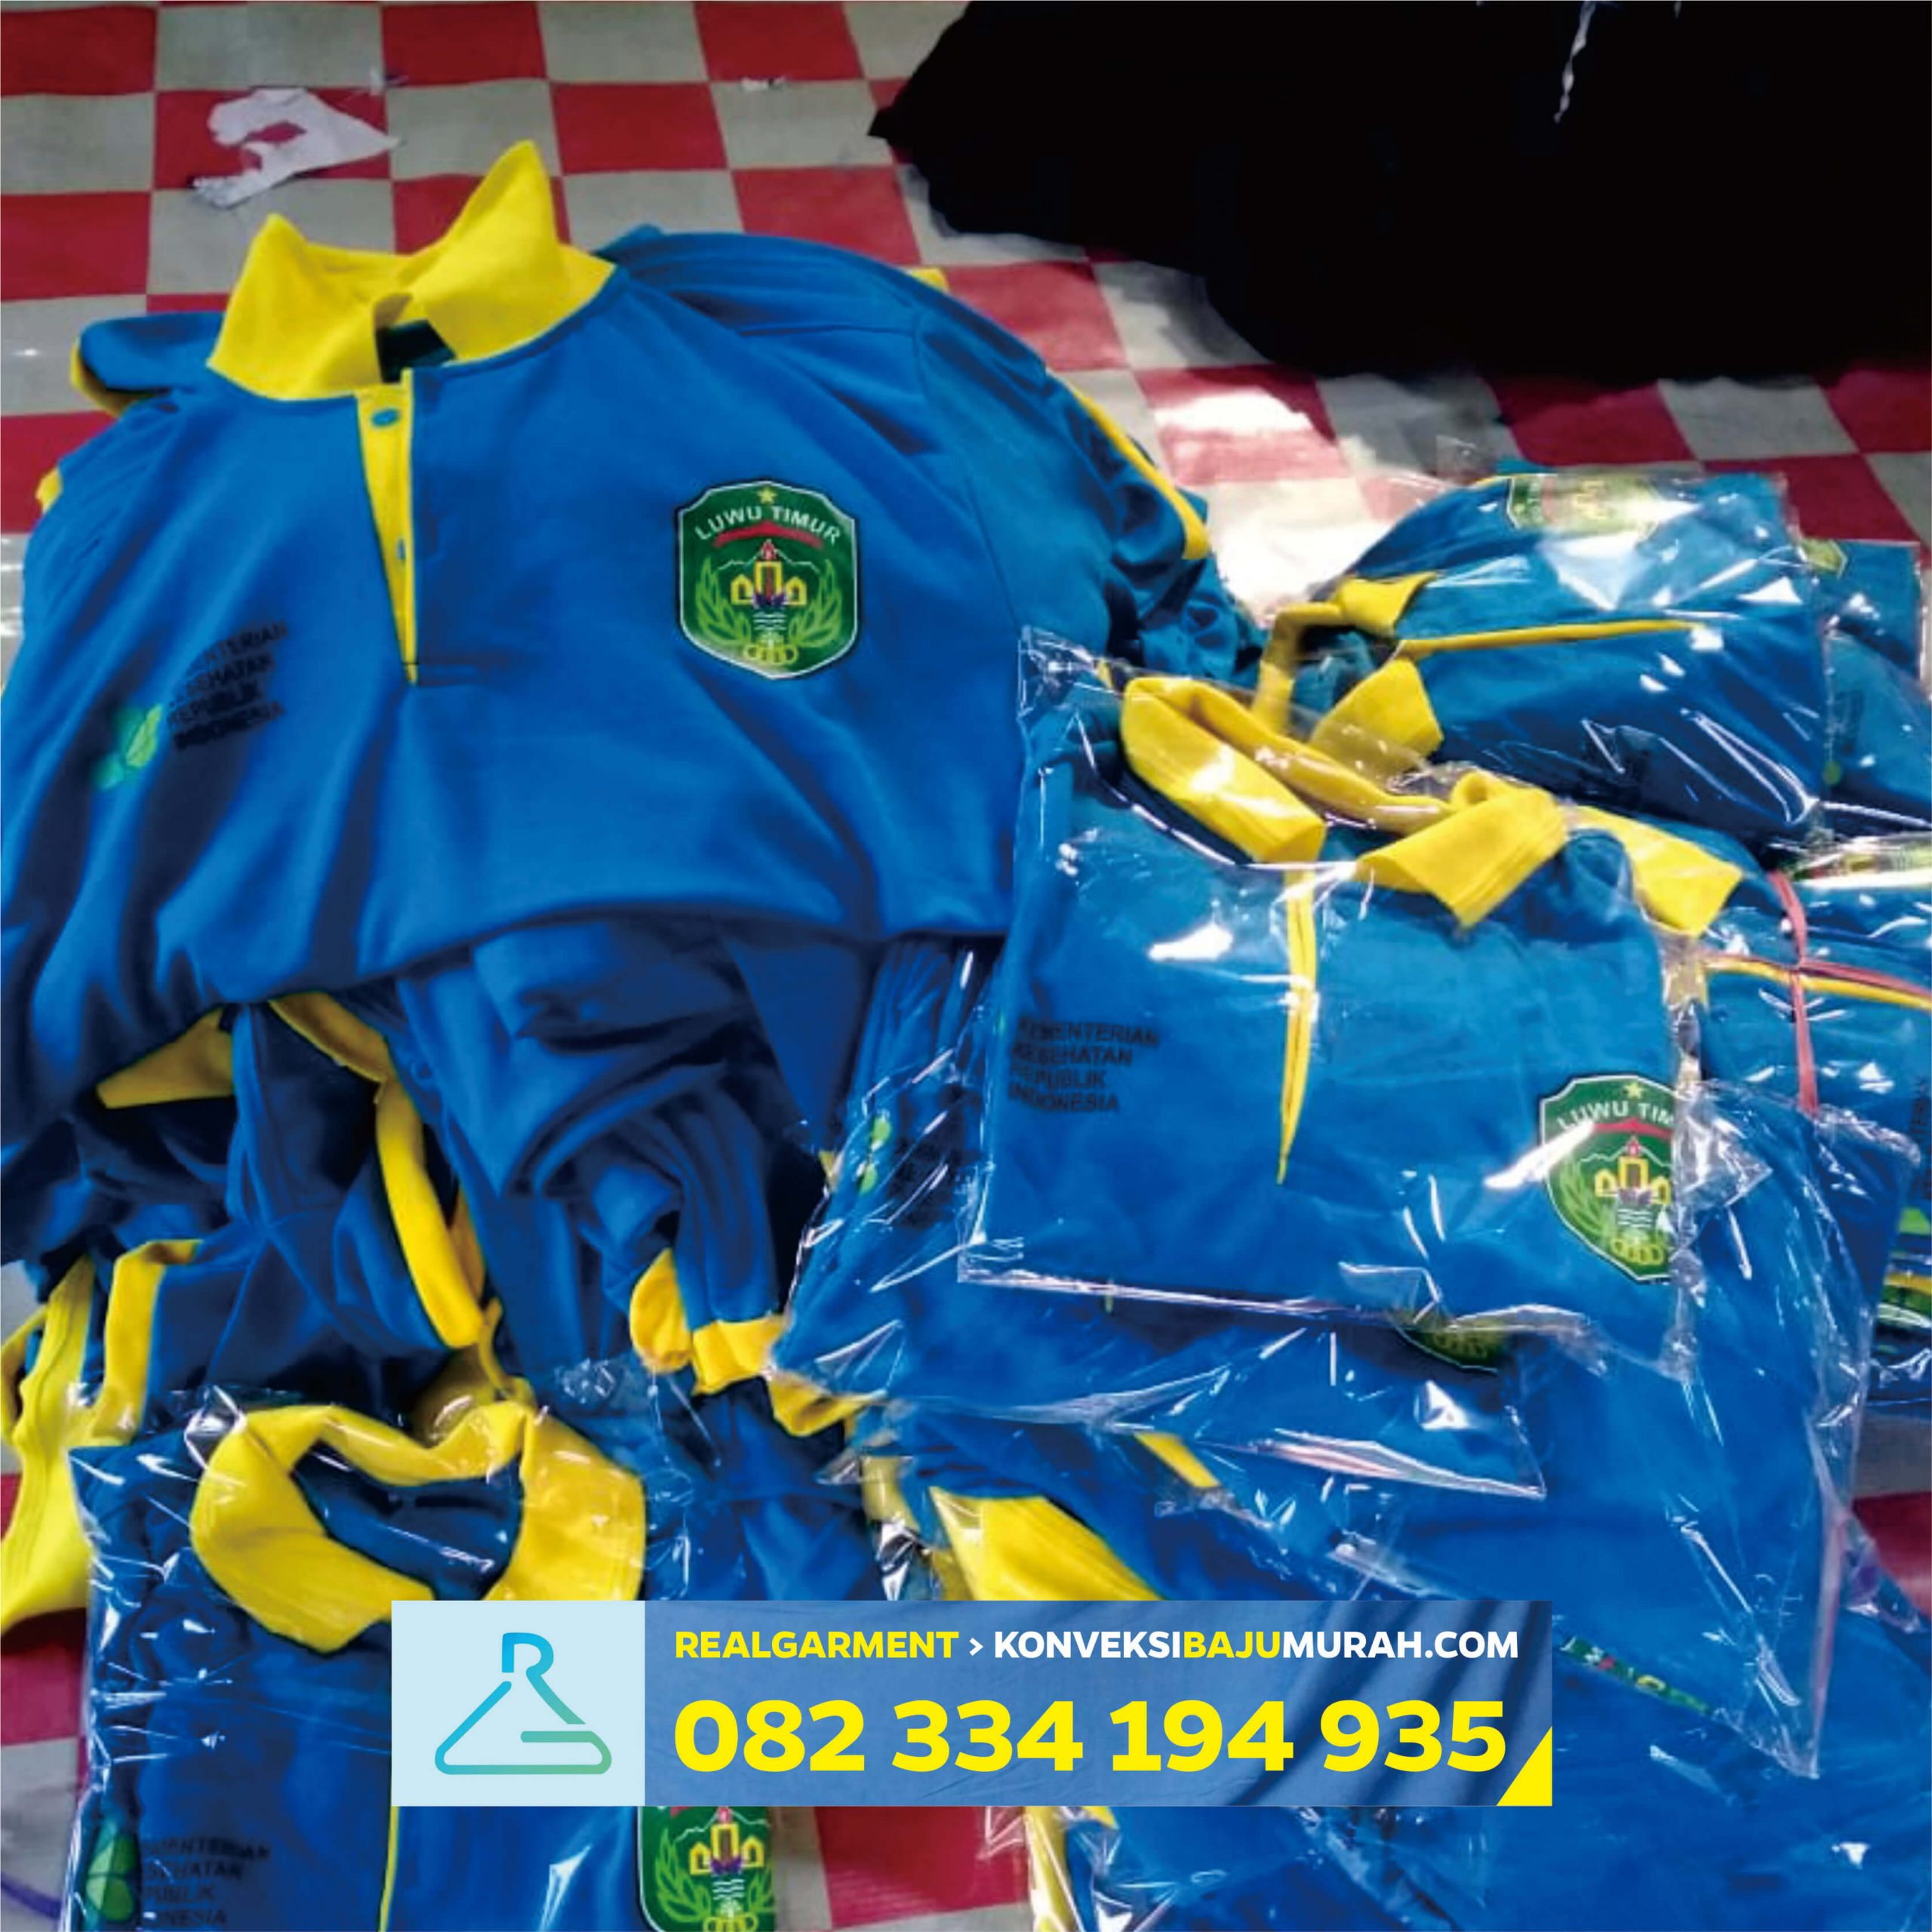 seragam kaos olahraga guru surabaya murah, seragam kaos olahraga lengan panjang surabaya, seragam kaos olahraga paud surabaya